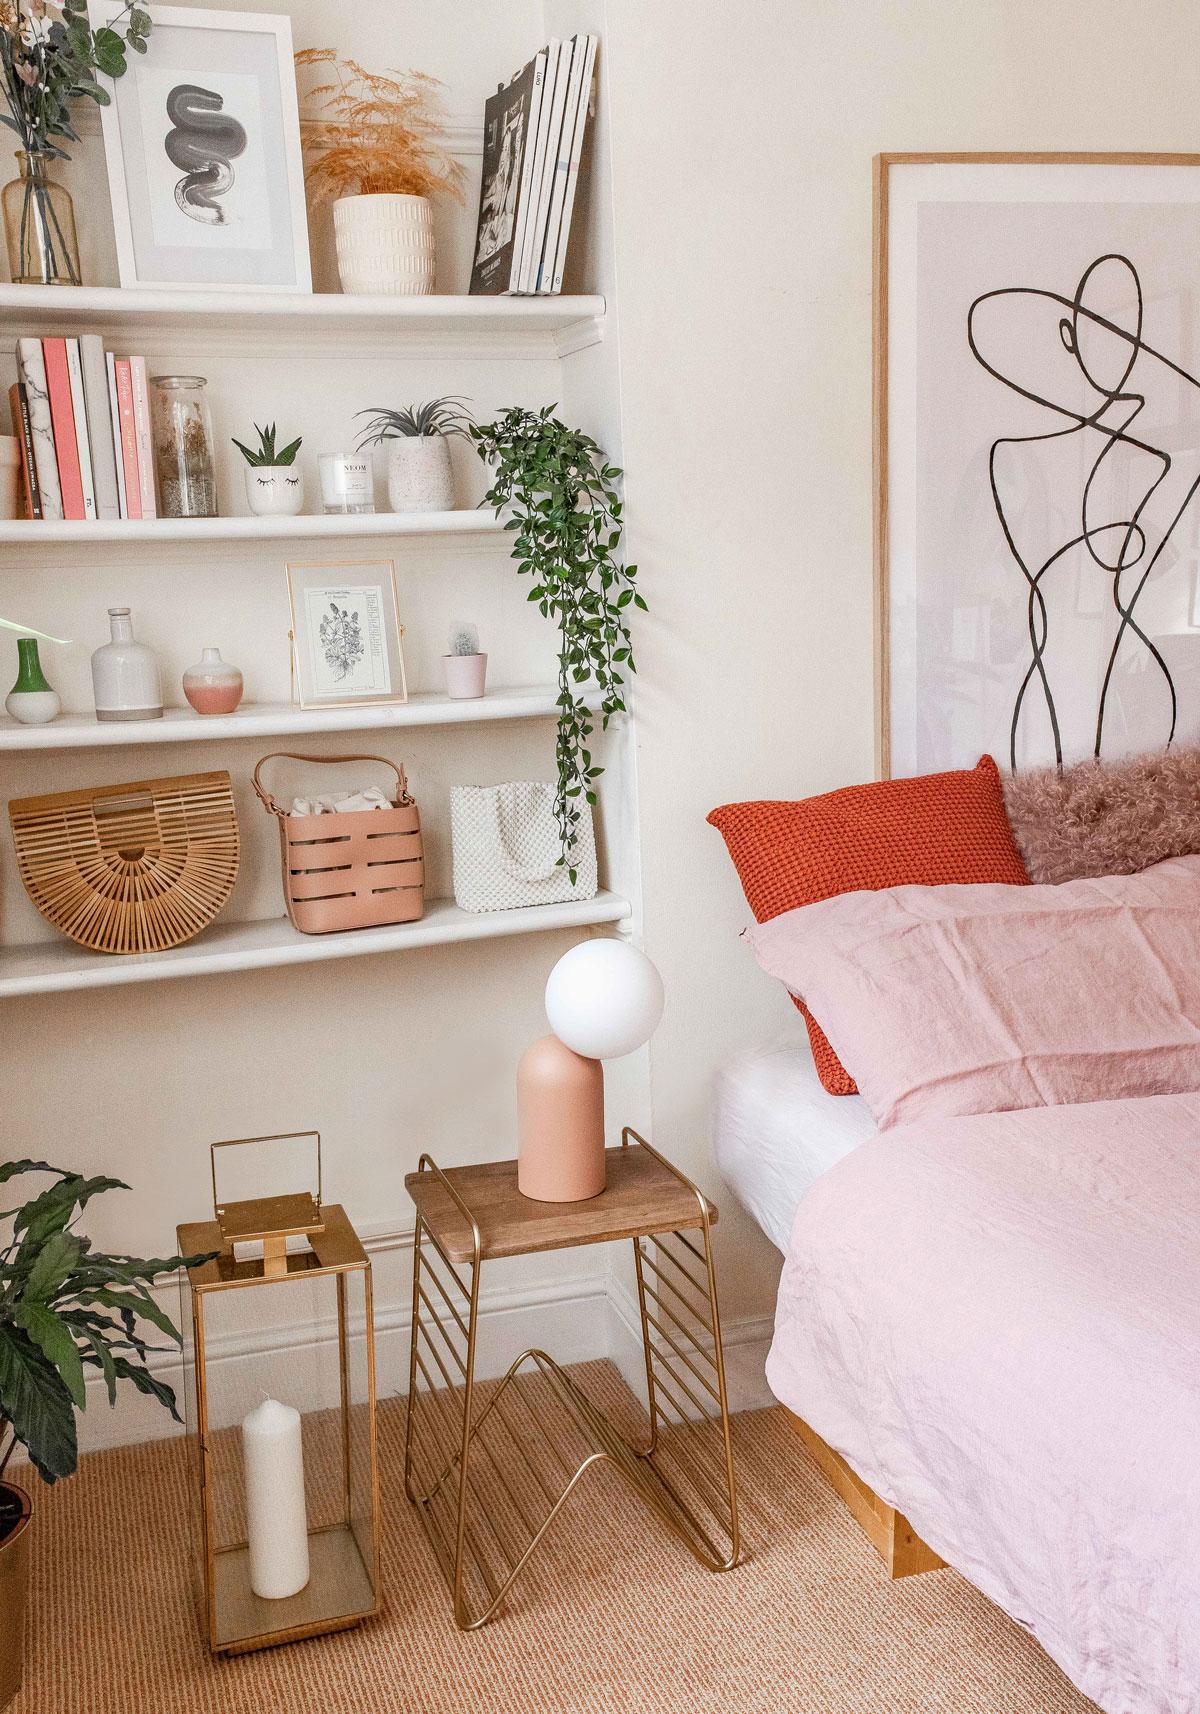 kelsey-heinrichs-@kelseyinlondon-made-bedroom-decoration-bedroom-ideas-bedroom-furniture-bedroom-inspiration-bedroom-styling-3